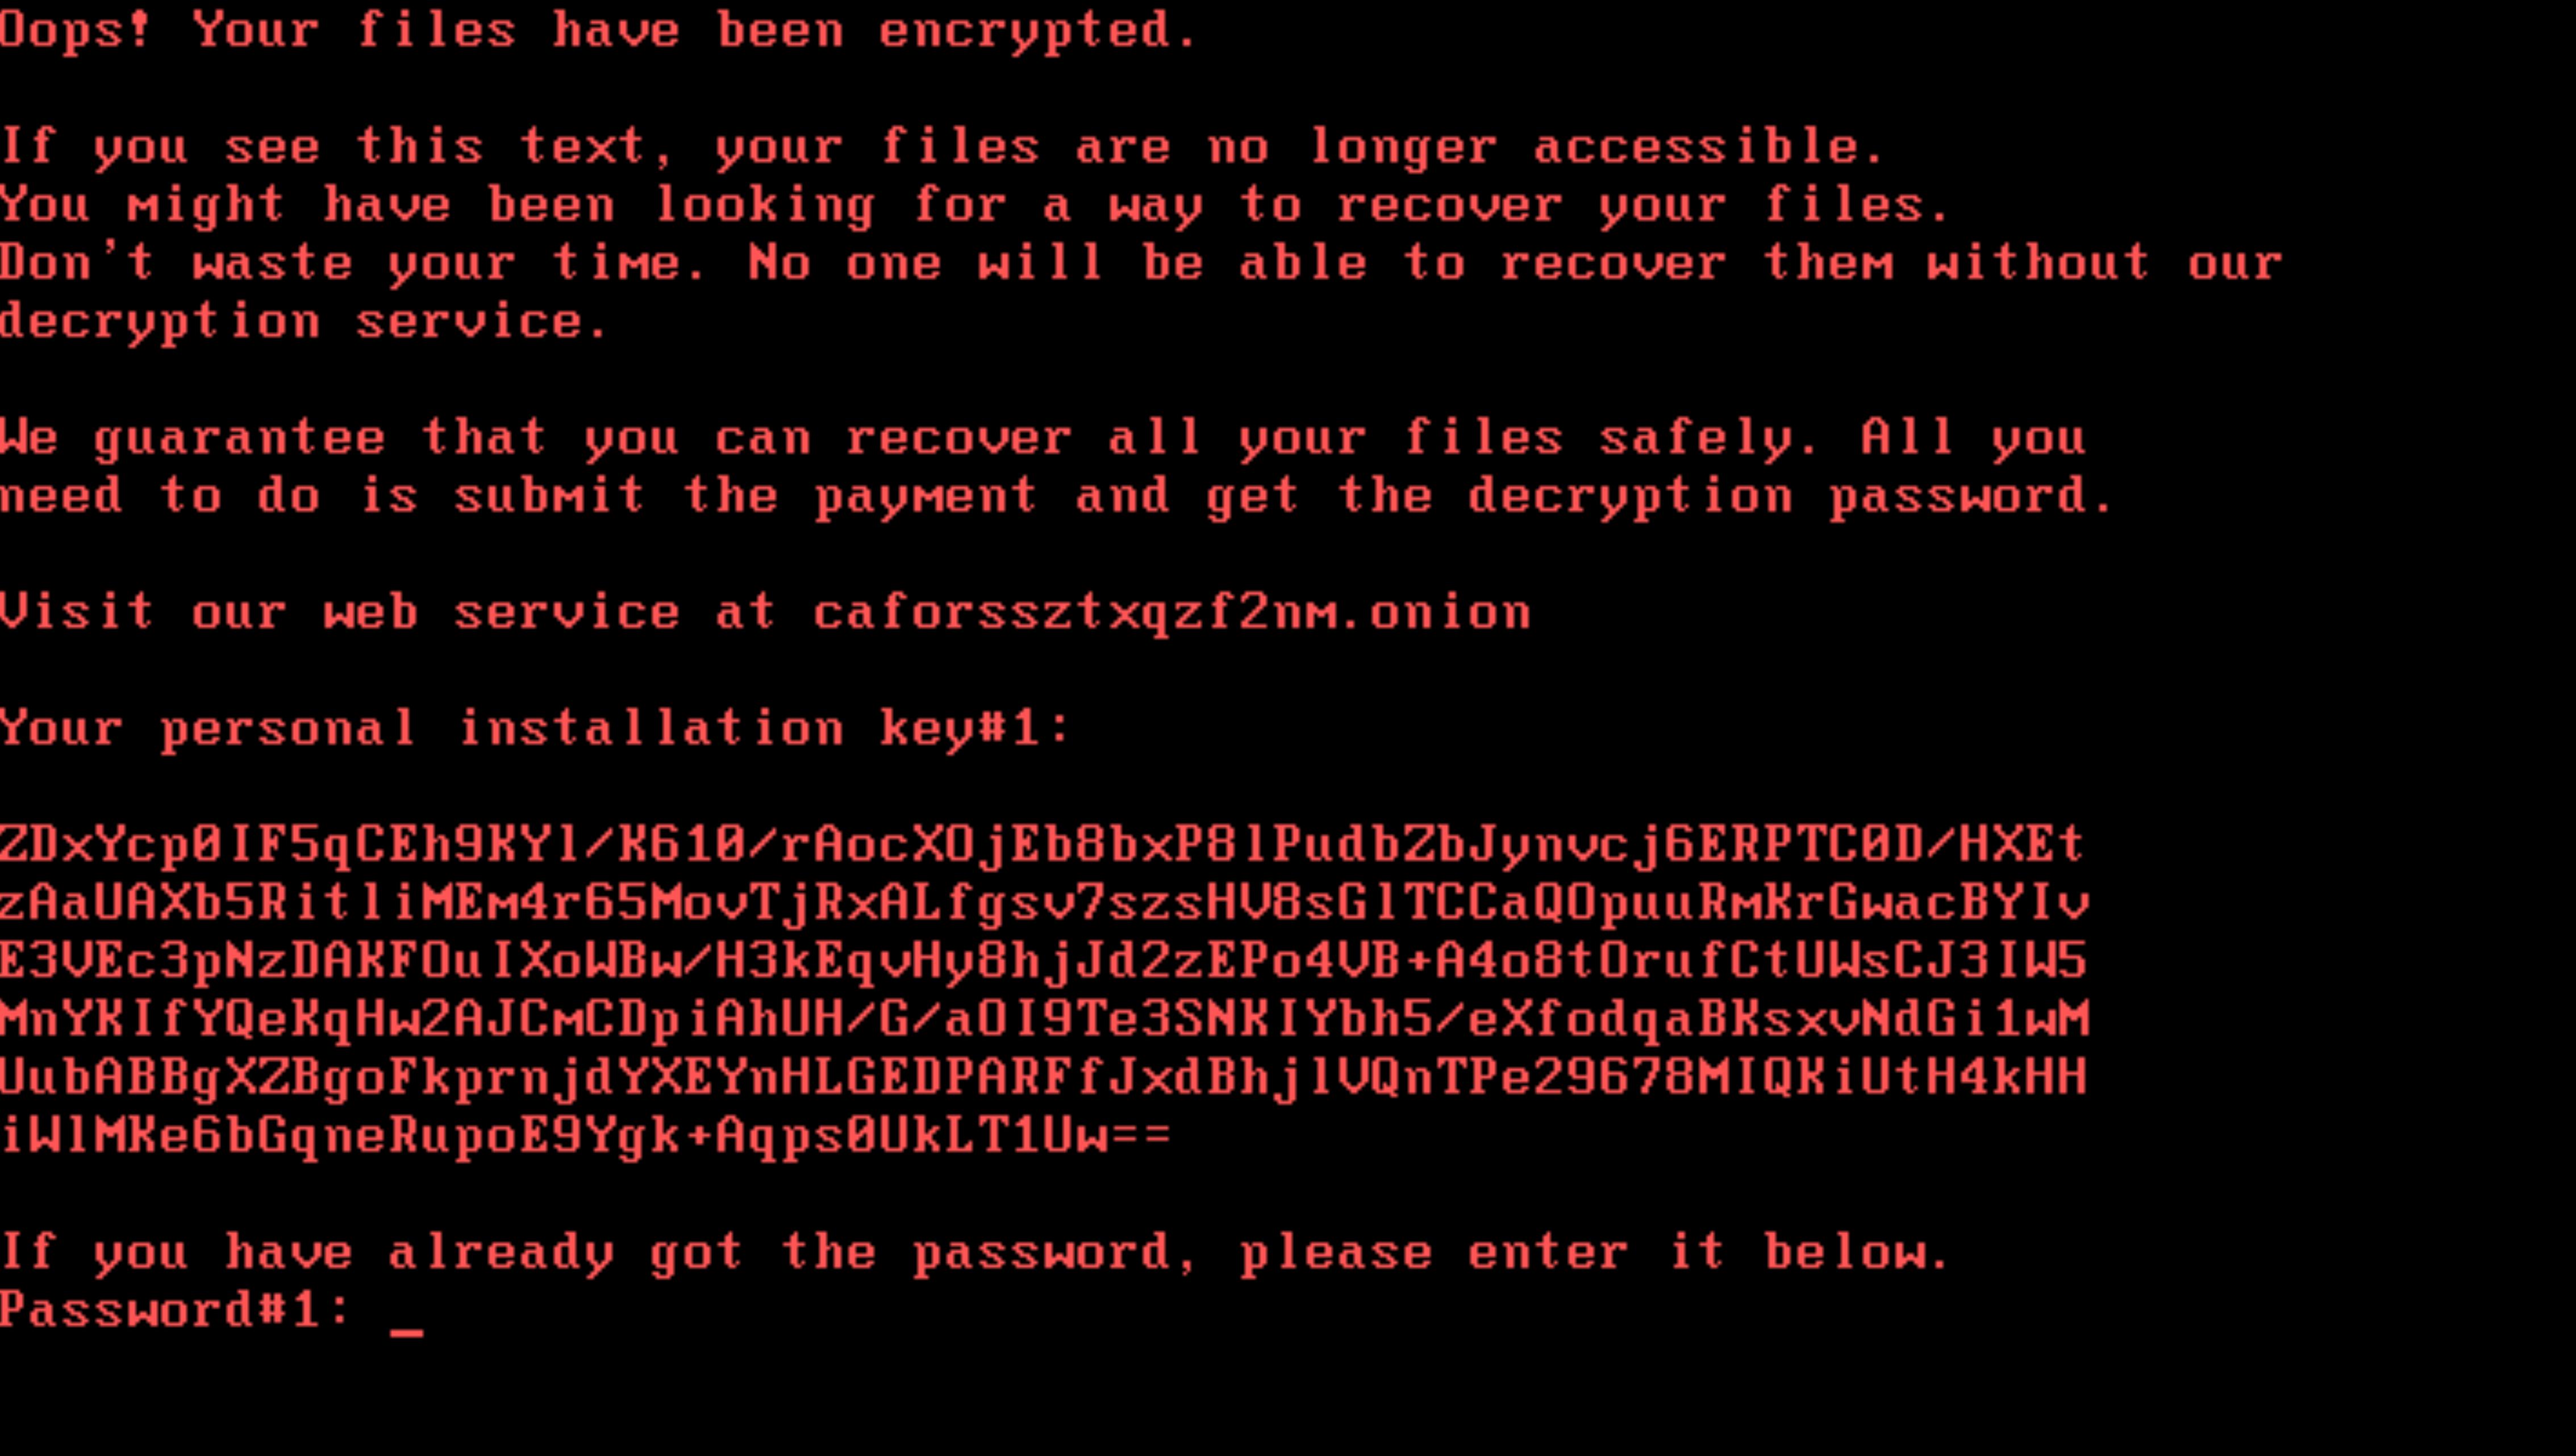 Encryption screen